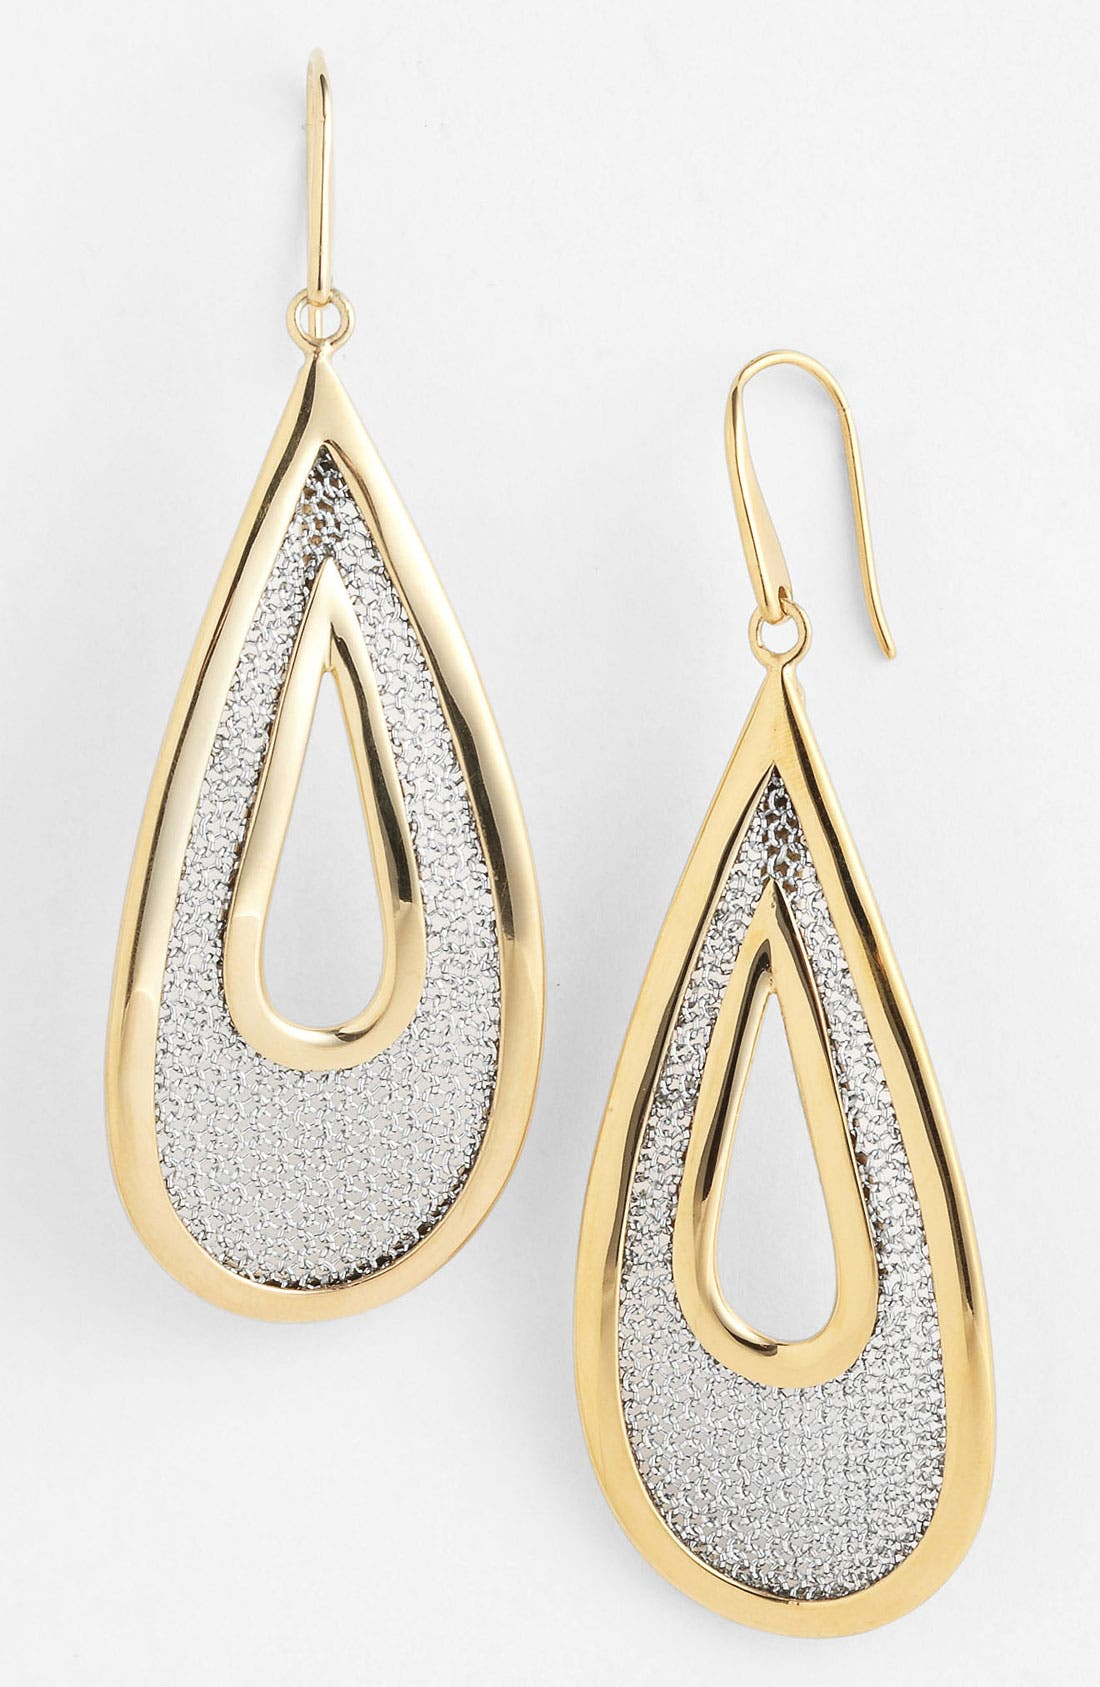 Alternate Image 1 Selected - Adami & Martucci 'Mesh' Large Open Teardrop Earrings (Nordstrom Exclusive)